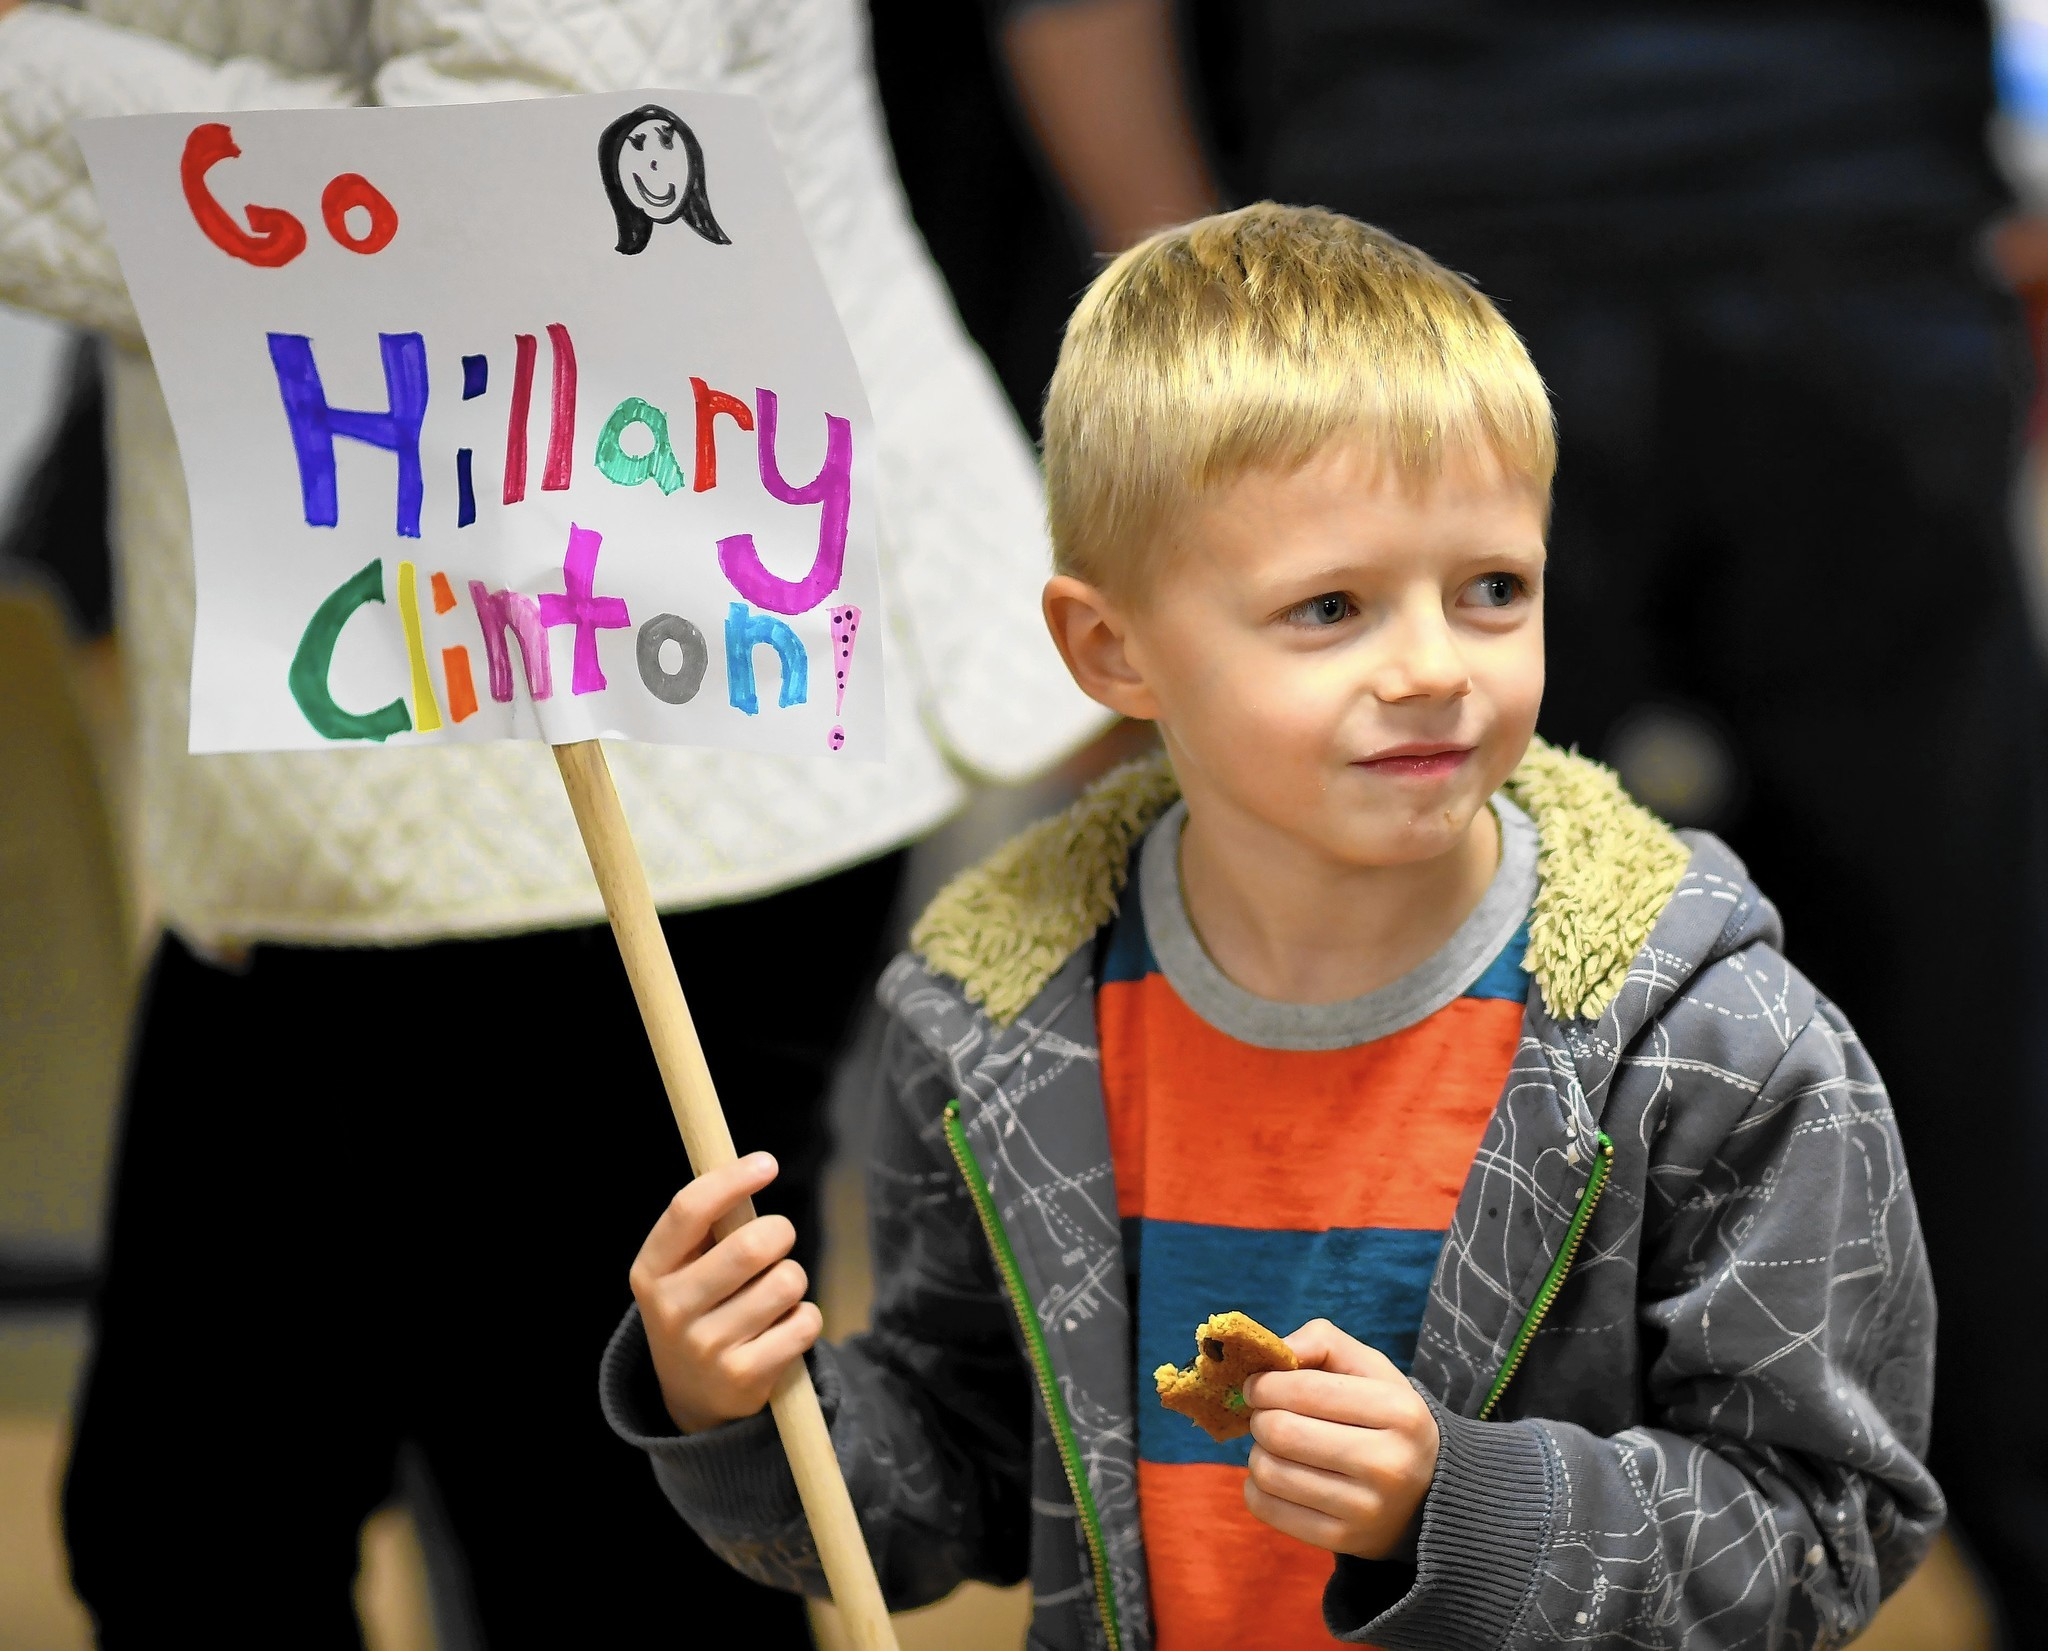 Unofficial Totals Show Hillary Clinton Won Hometown Park